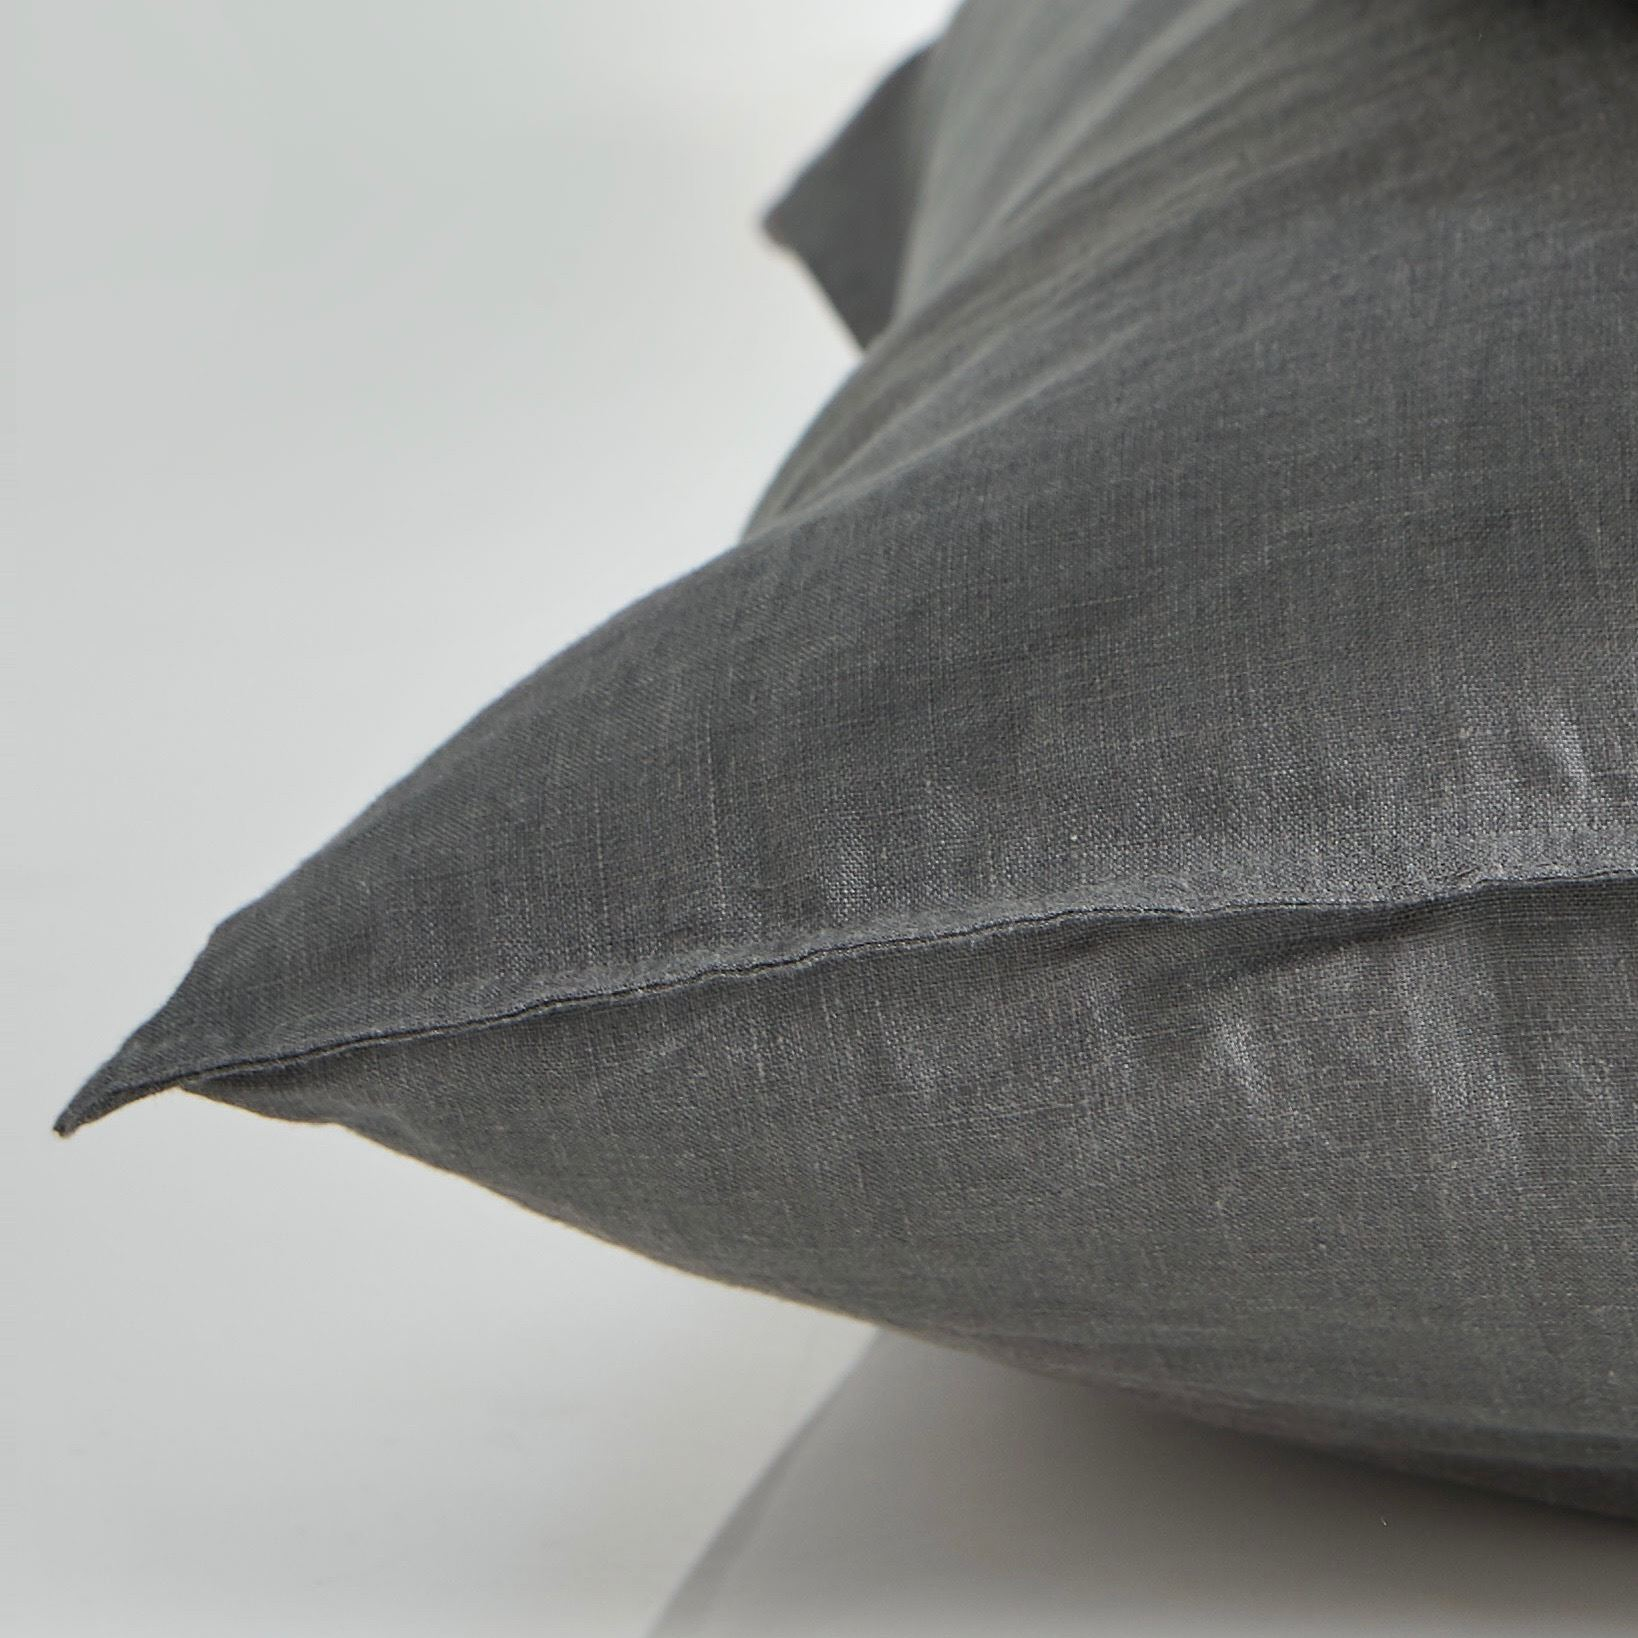 Picture of Pure linen European Pillow Case - Smoke